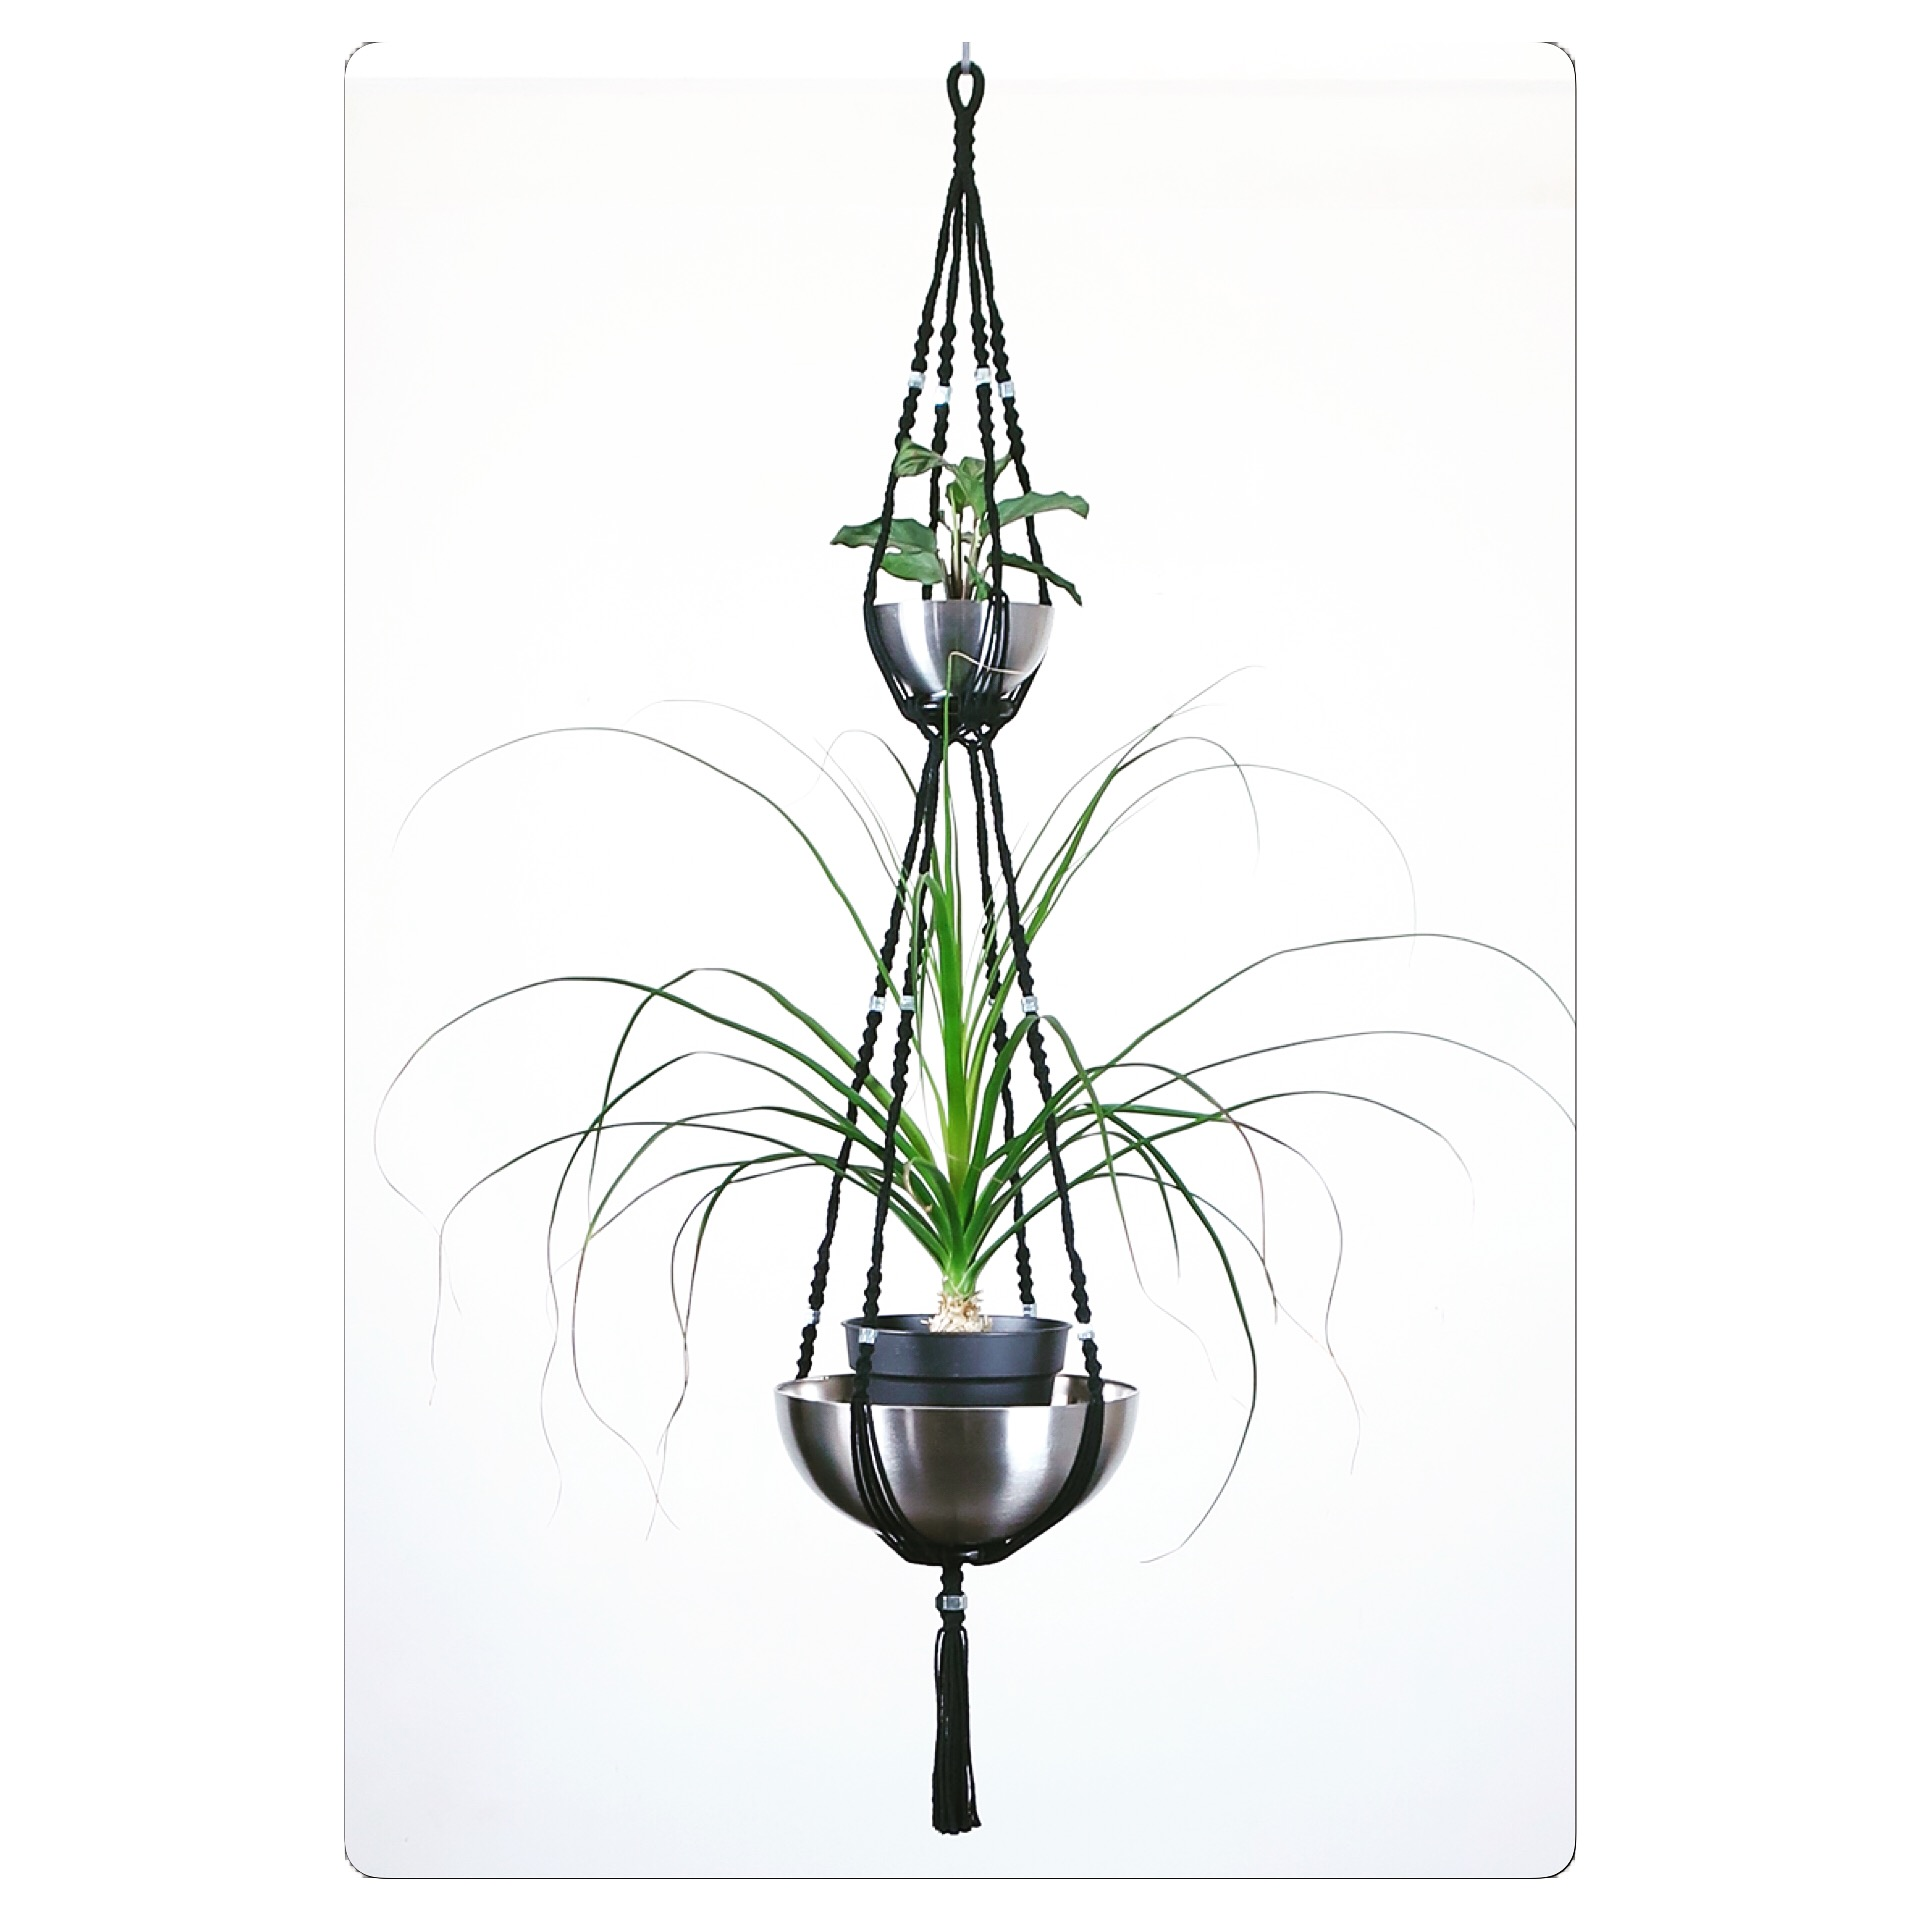 suspension pour plantes en macram 2 tages obra. Black Bedroom Furniture Sets. Home Design Ideas